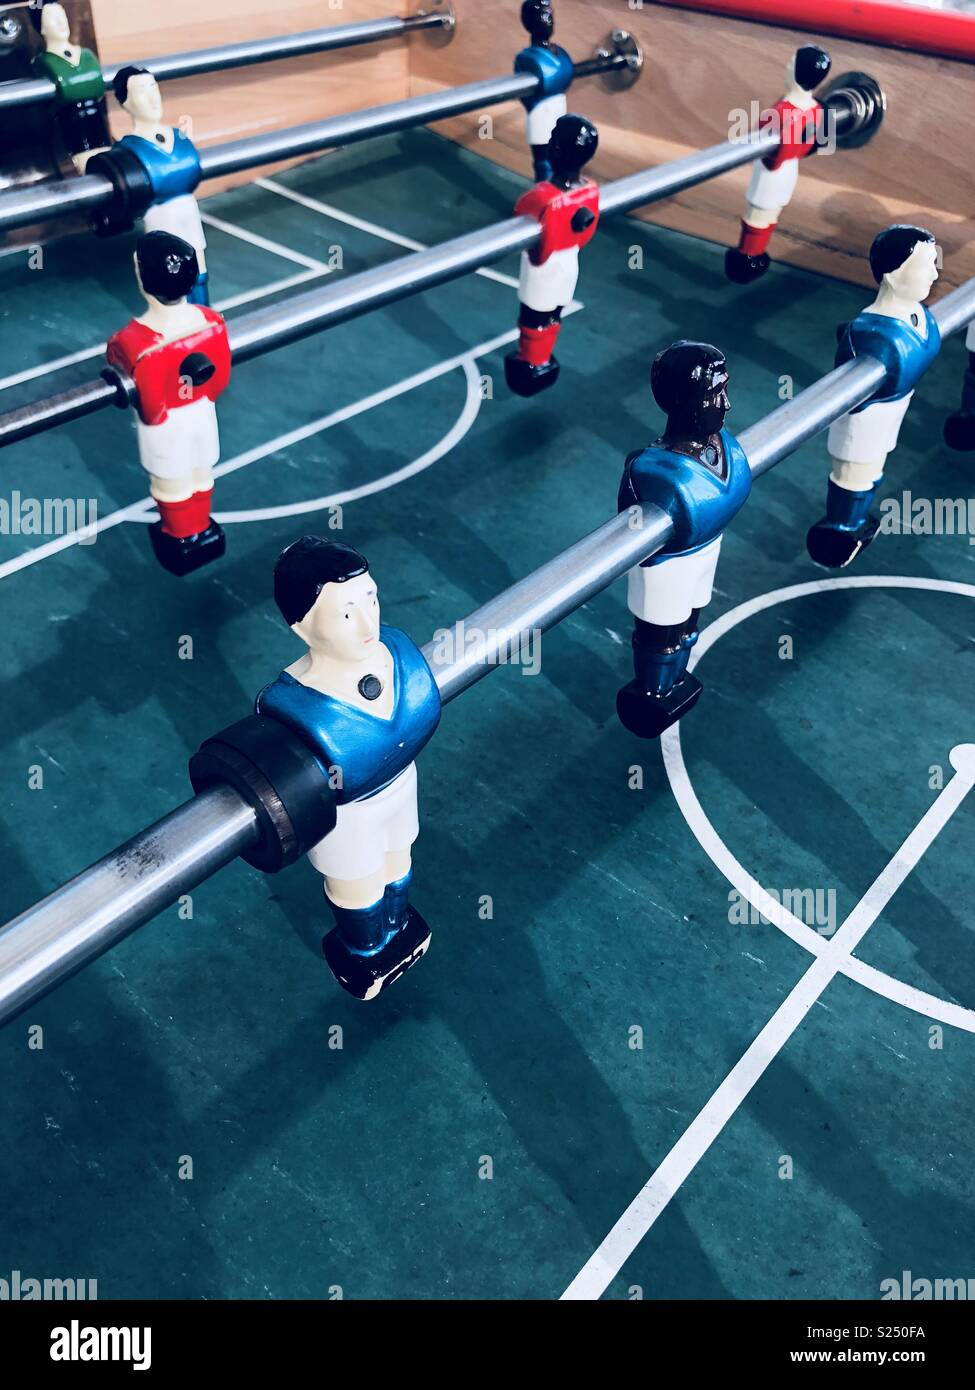 Table football footballer characters - Stock Image